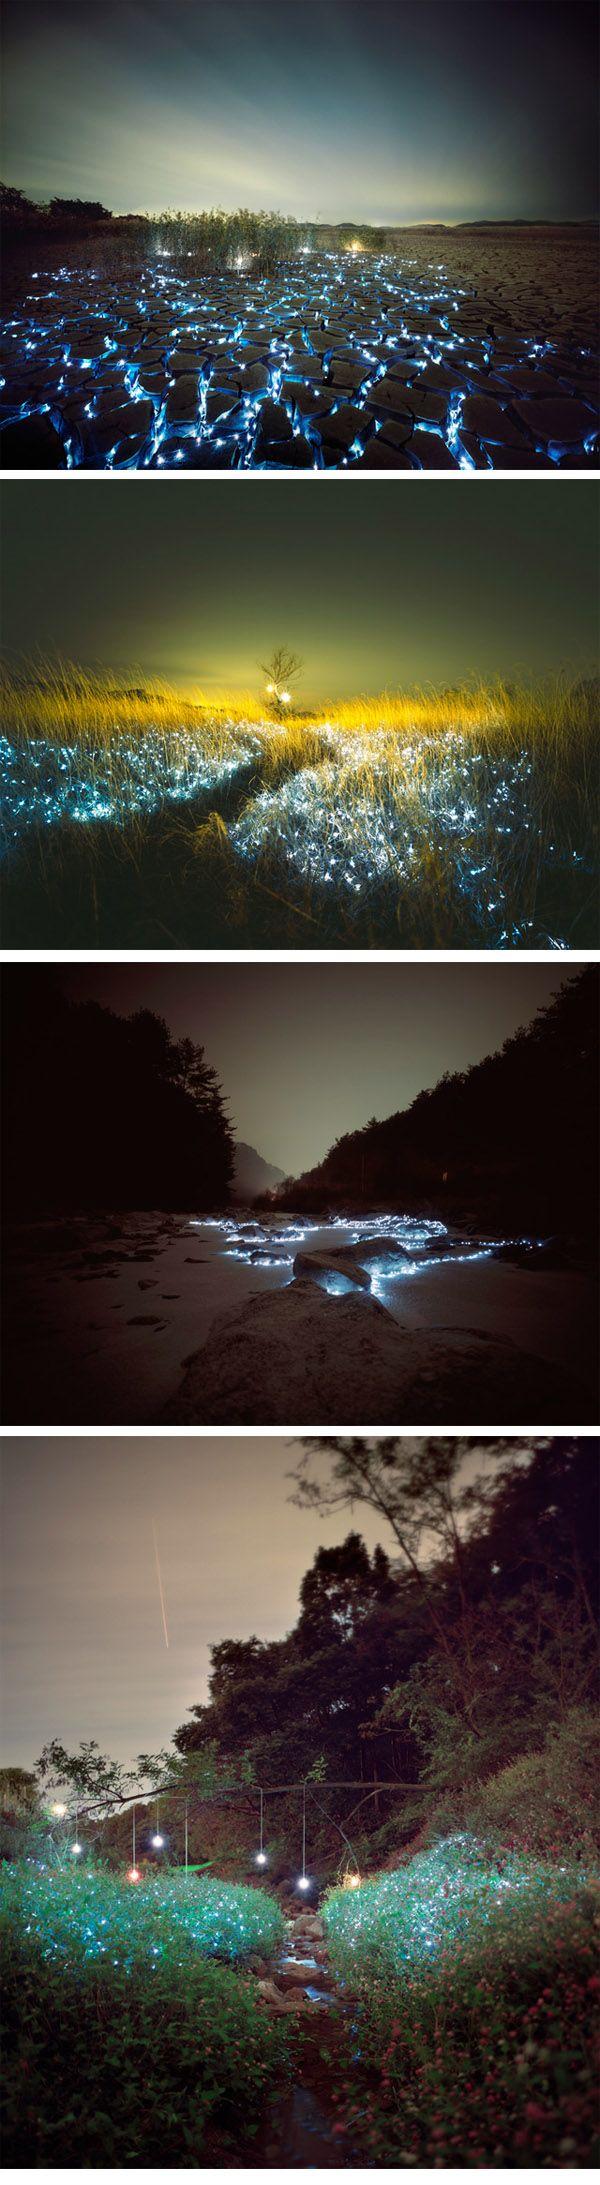 Starry Night by Lee Eunyeol: 600 2 185 Pixels, Eunyeol Jessie, Installations Light, Starry Night, Pictures Places, Art, Lee Eunyeol Repin, Faeries Creep, Eunyeol Repin By Pinterest